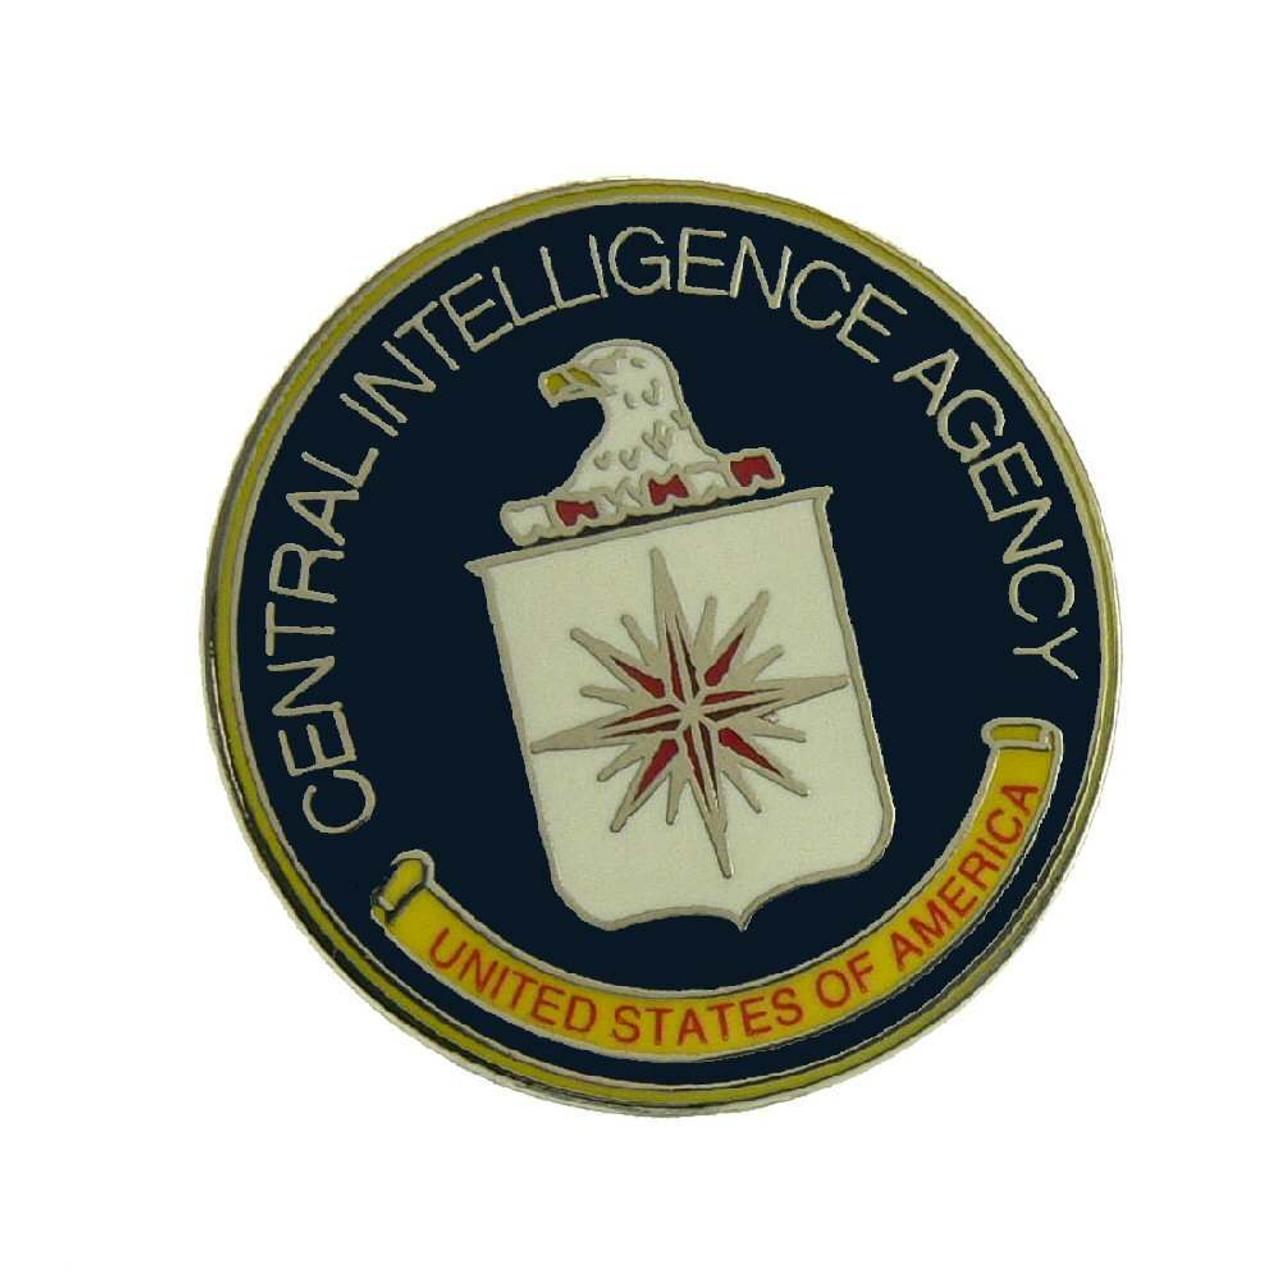 California Security Agency